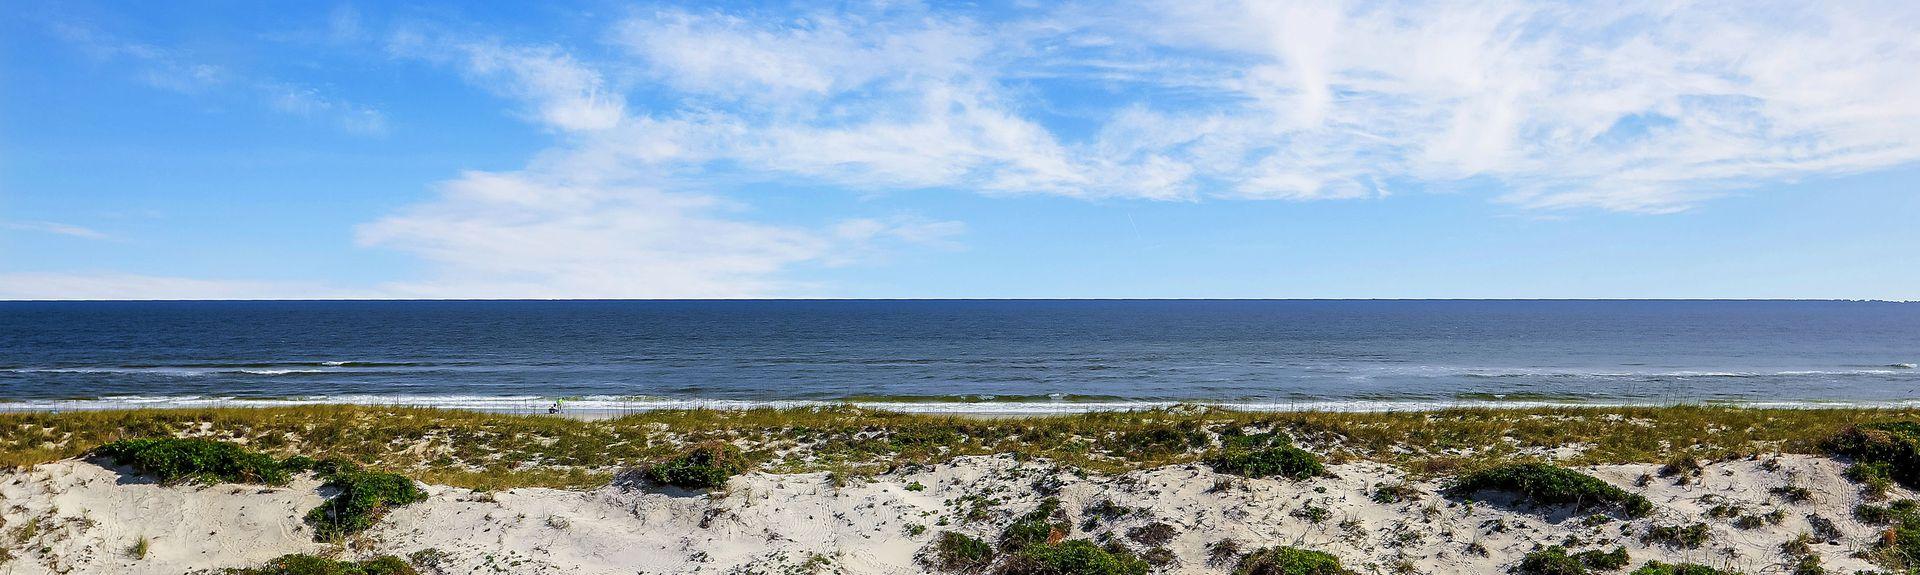 Sailmaker, Northside, Jacksonville, FL, USA